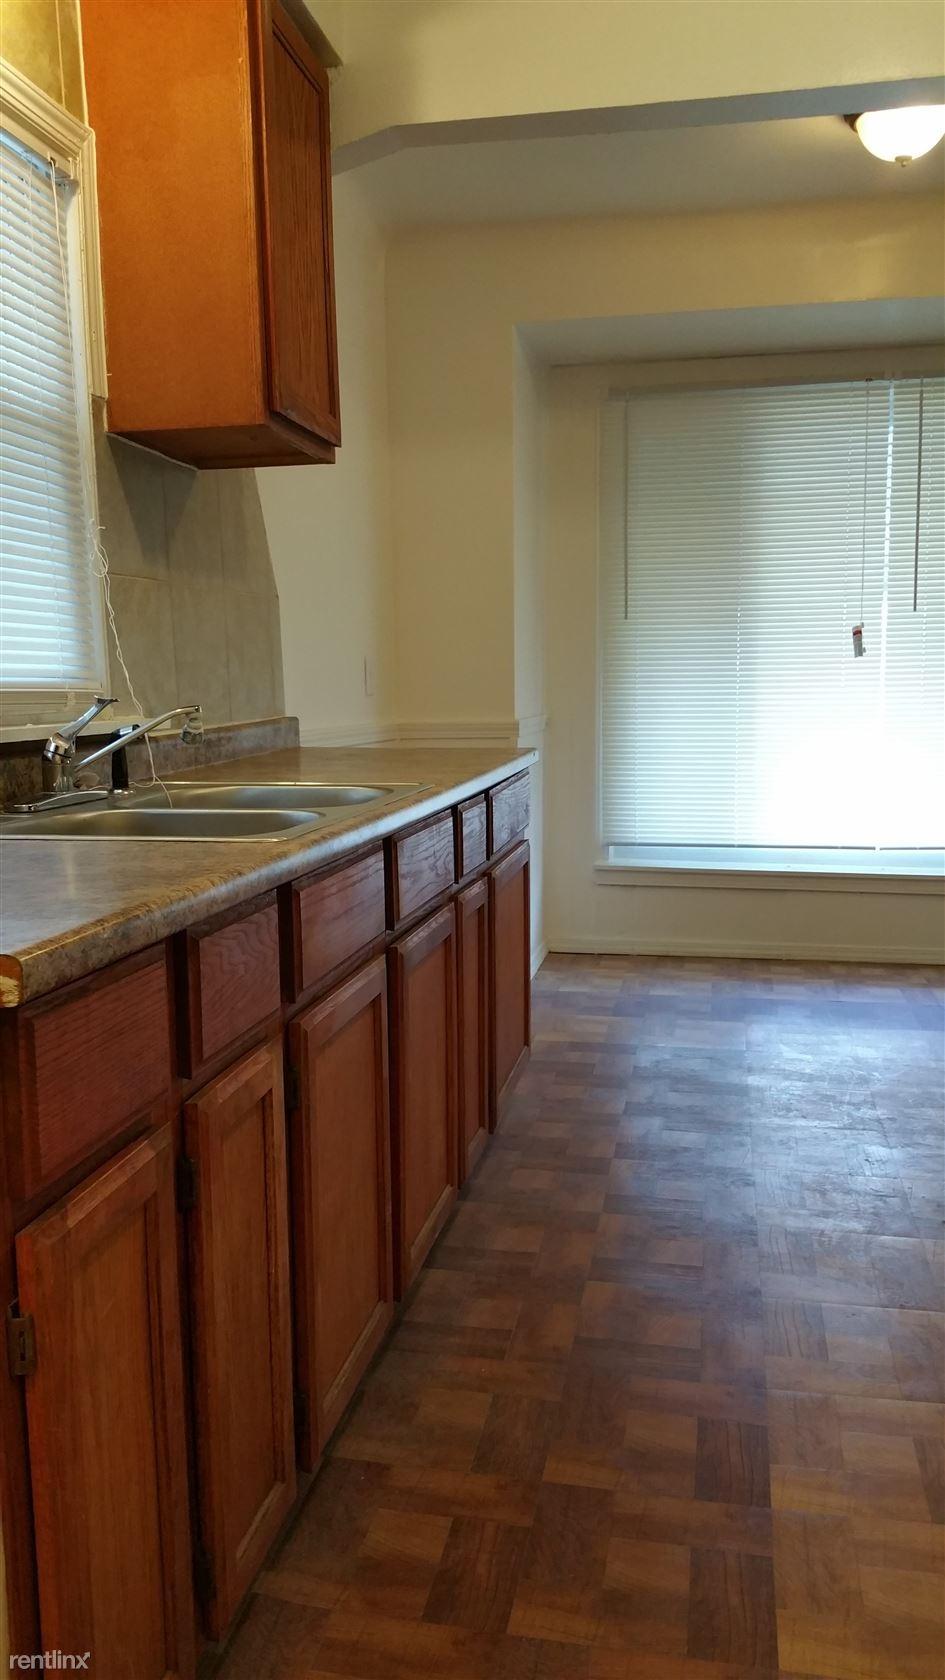 21315 Pembroke Ave Detroit Mi 48219 3 Bedroom Apartment For Rent Padmapper